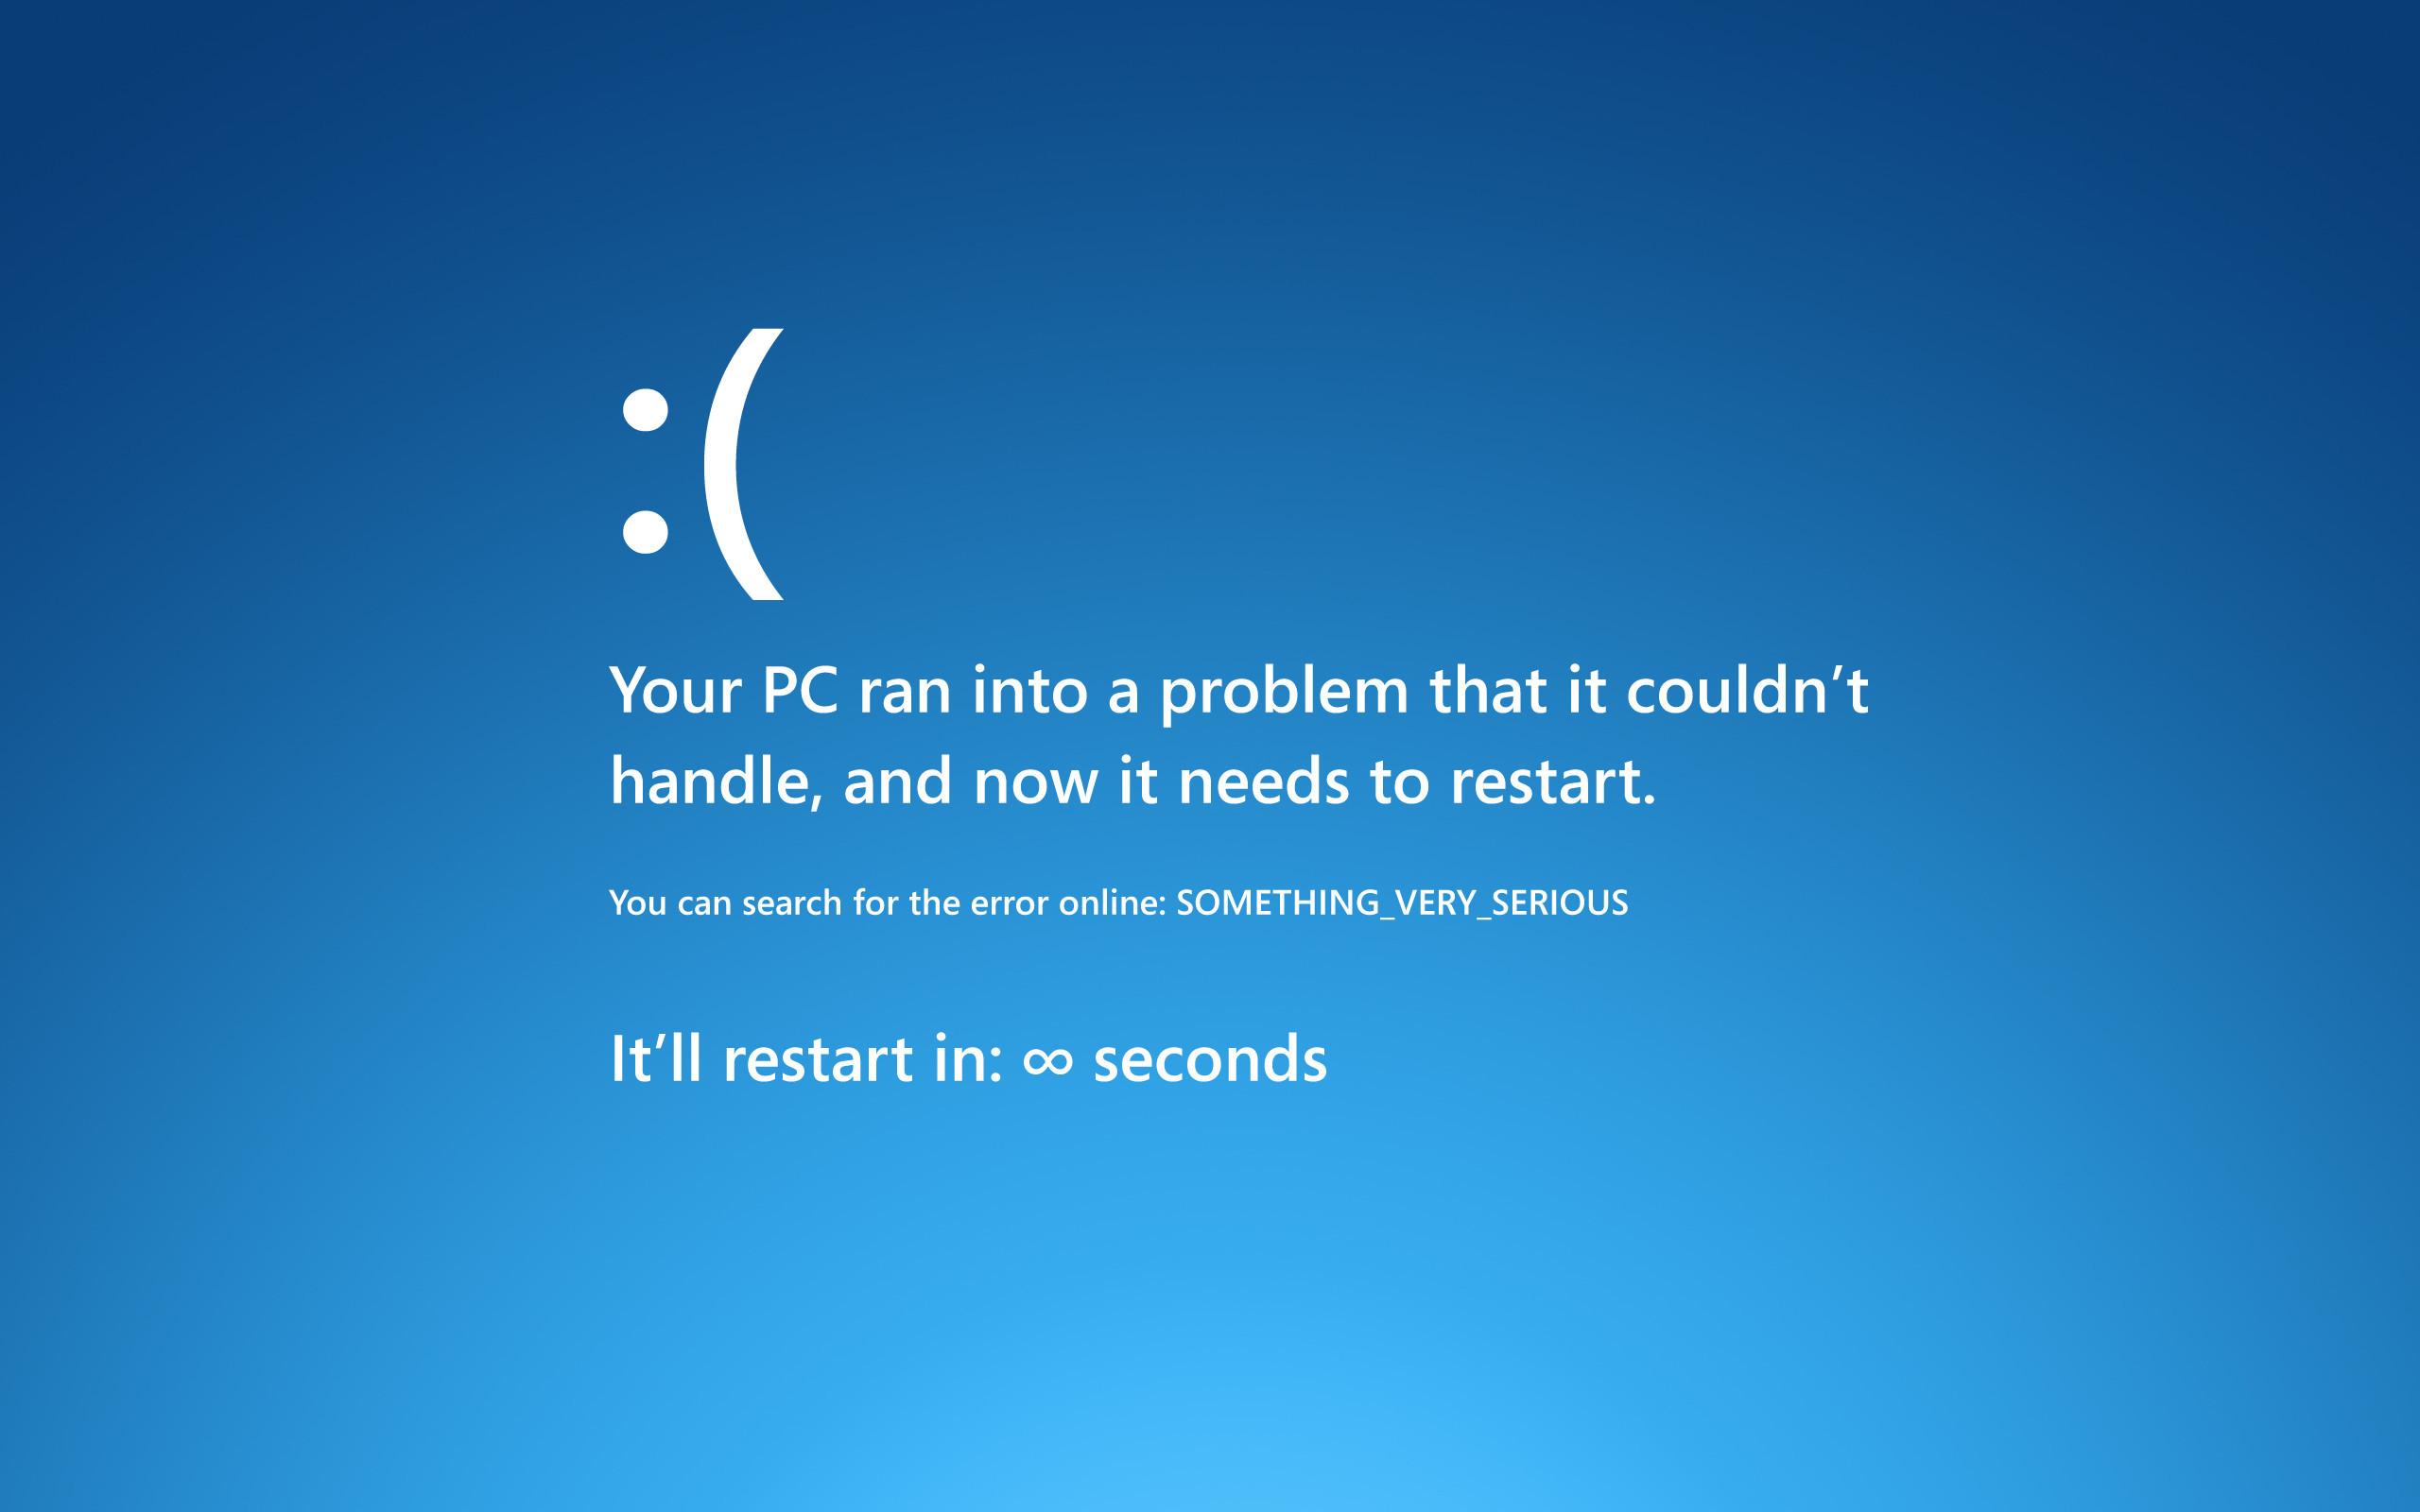 The Windows Blue Screen of Death Makes a Hilarious iPad Lock Screen